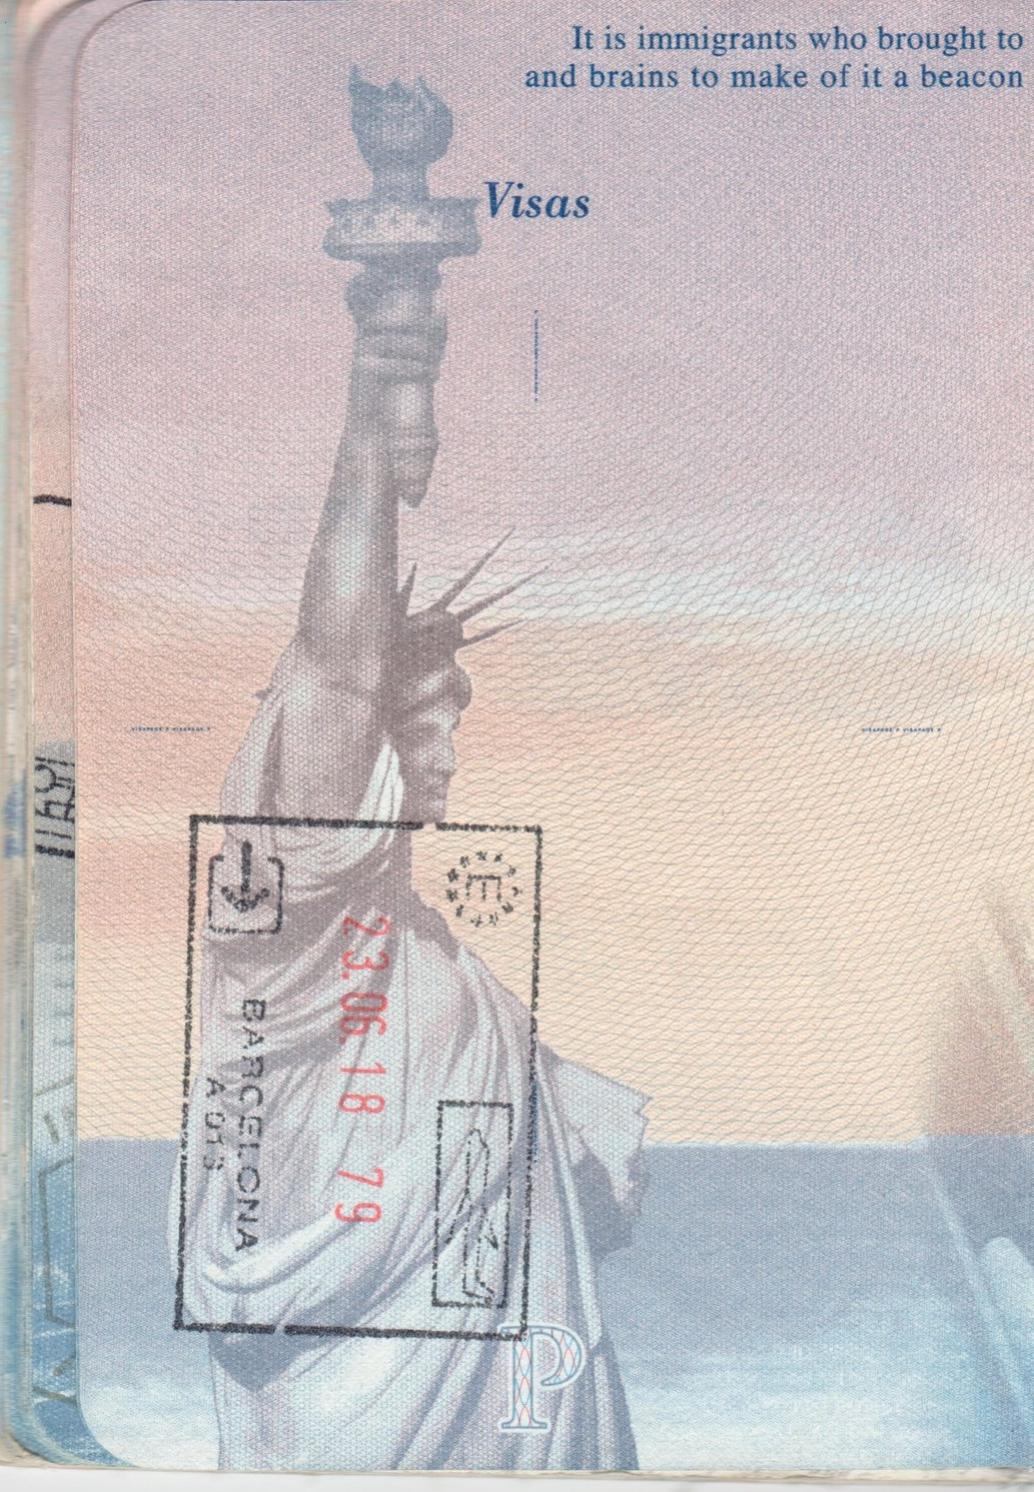 Barcelona Spain Passport Stamp